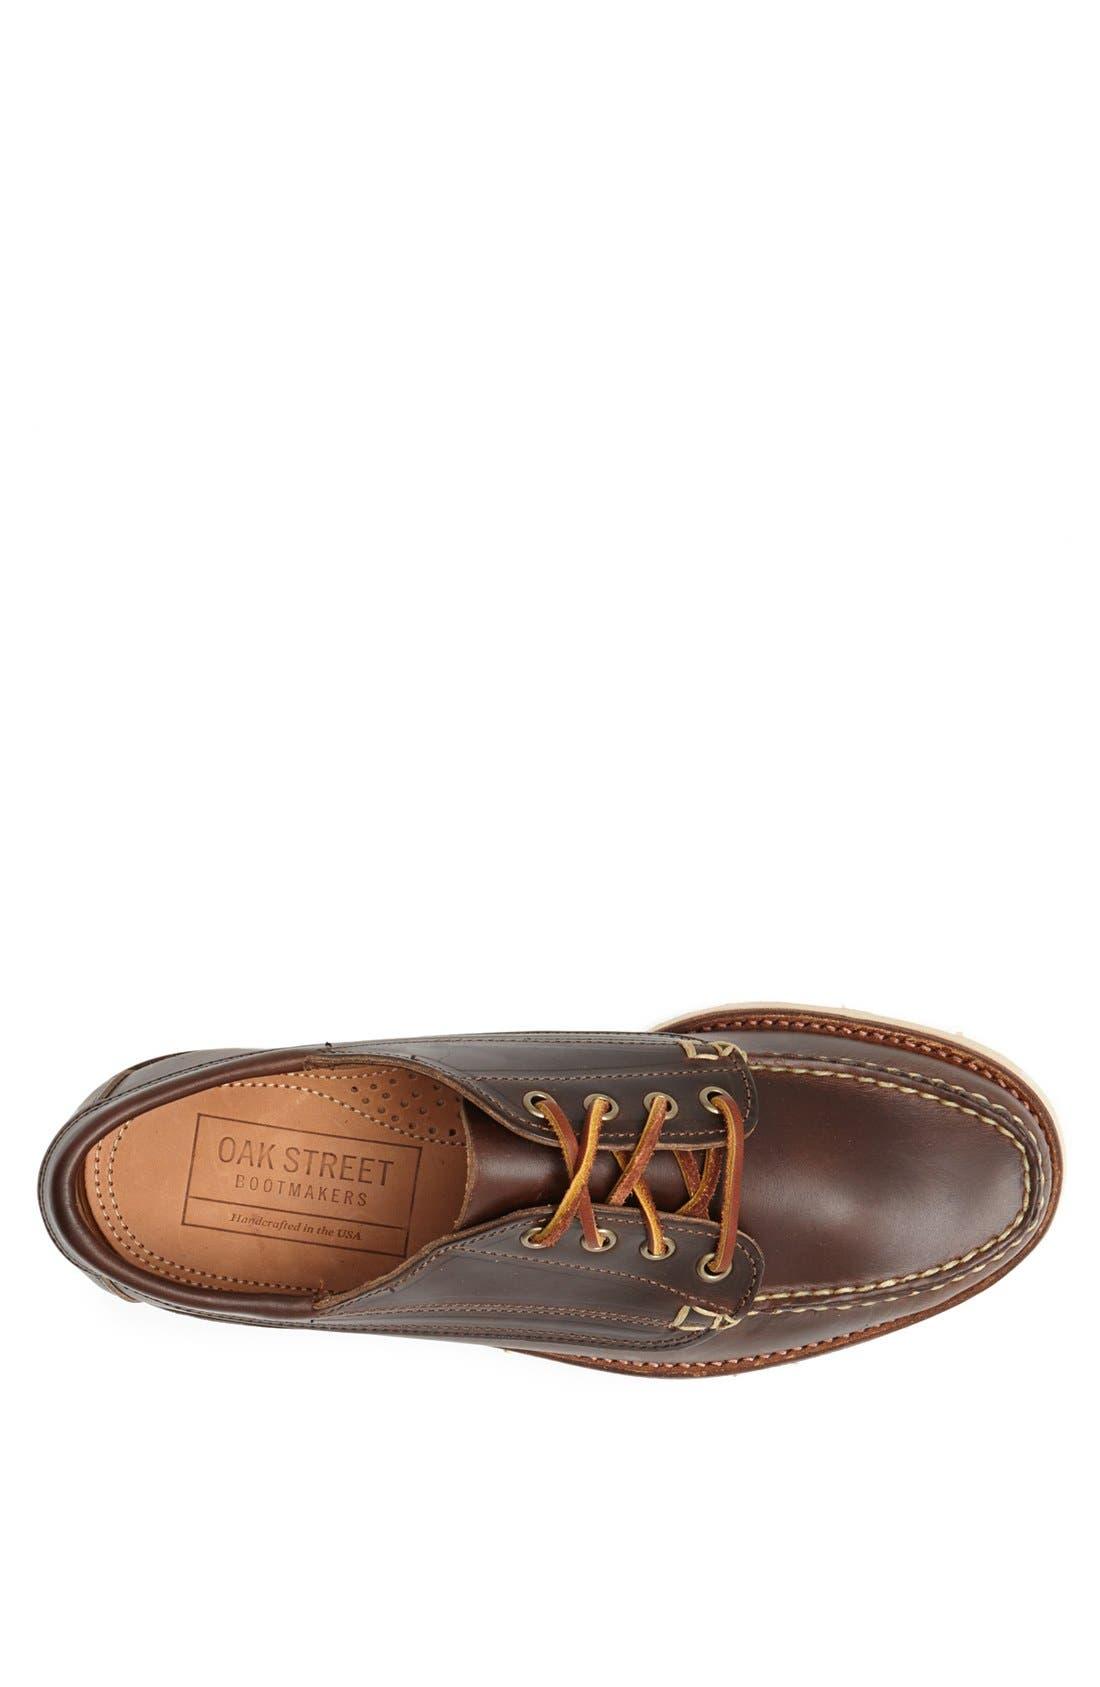 Alternate Image 3  - Oak Street Bootmakers Leather Trail Derby